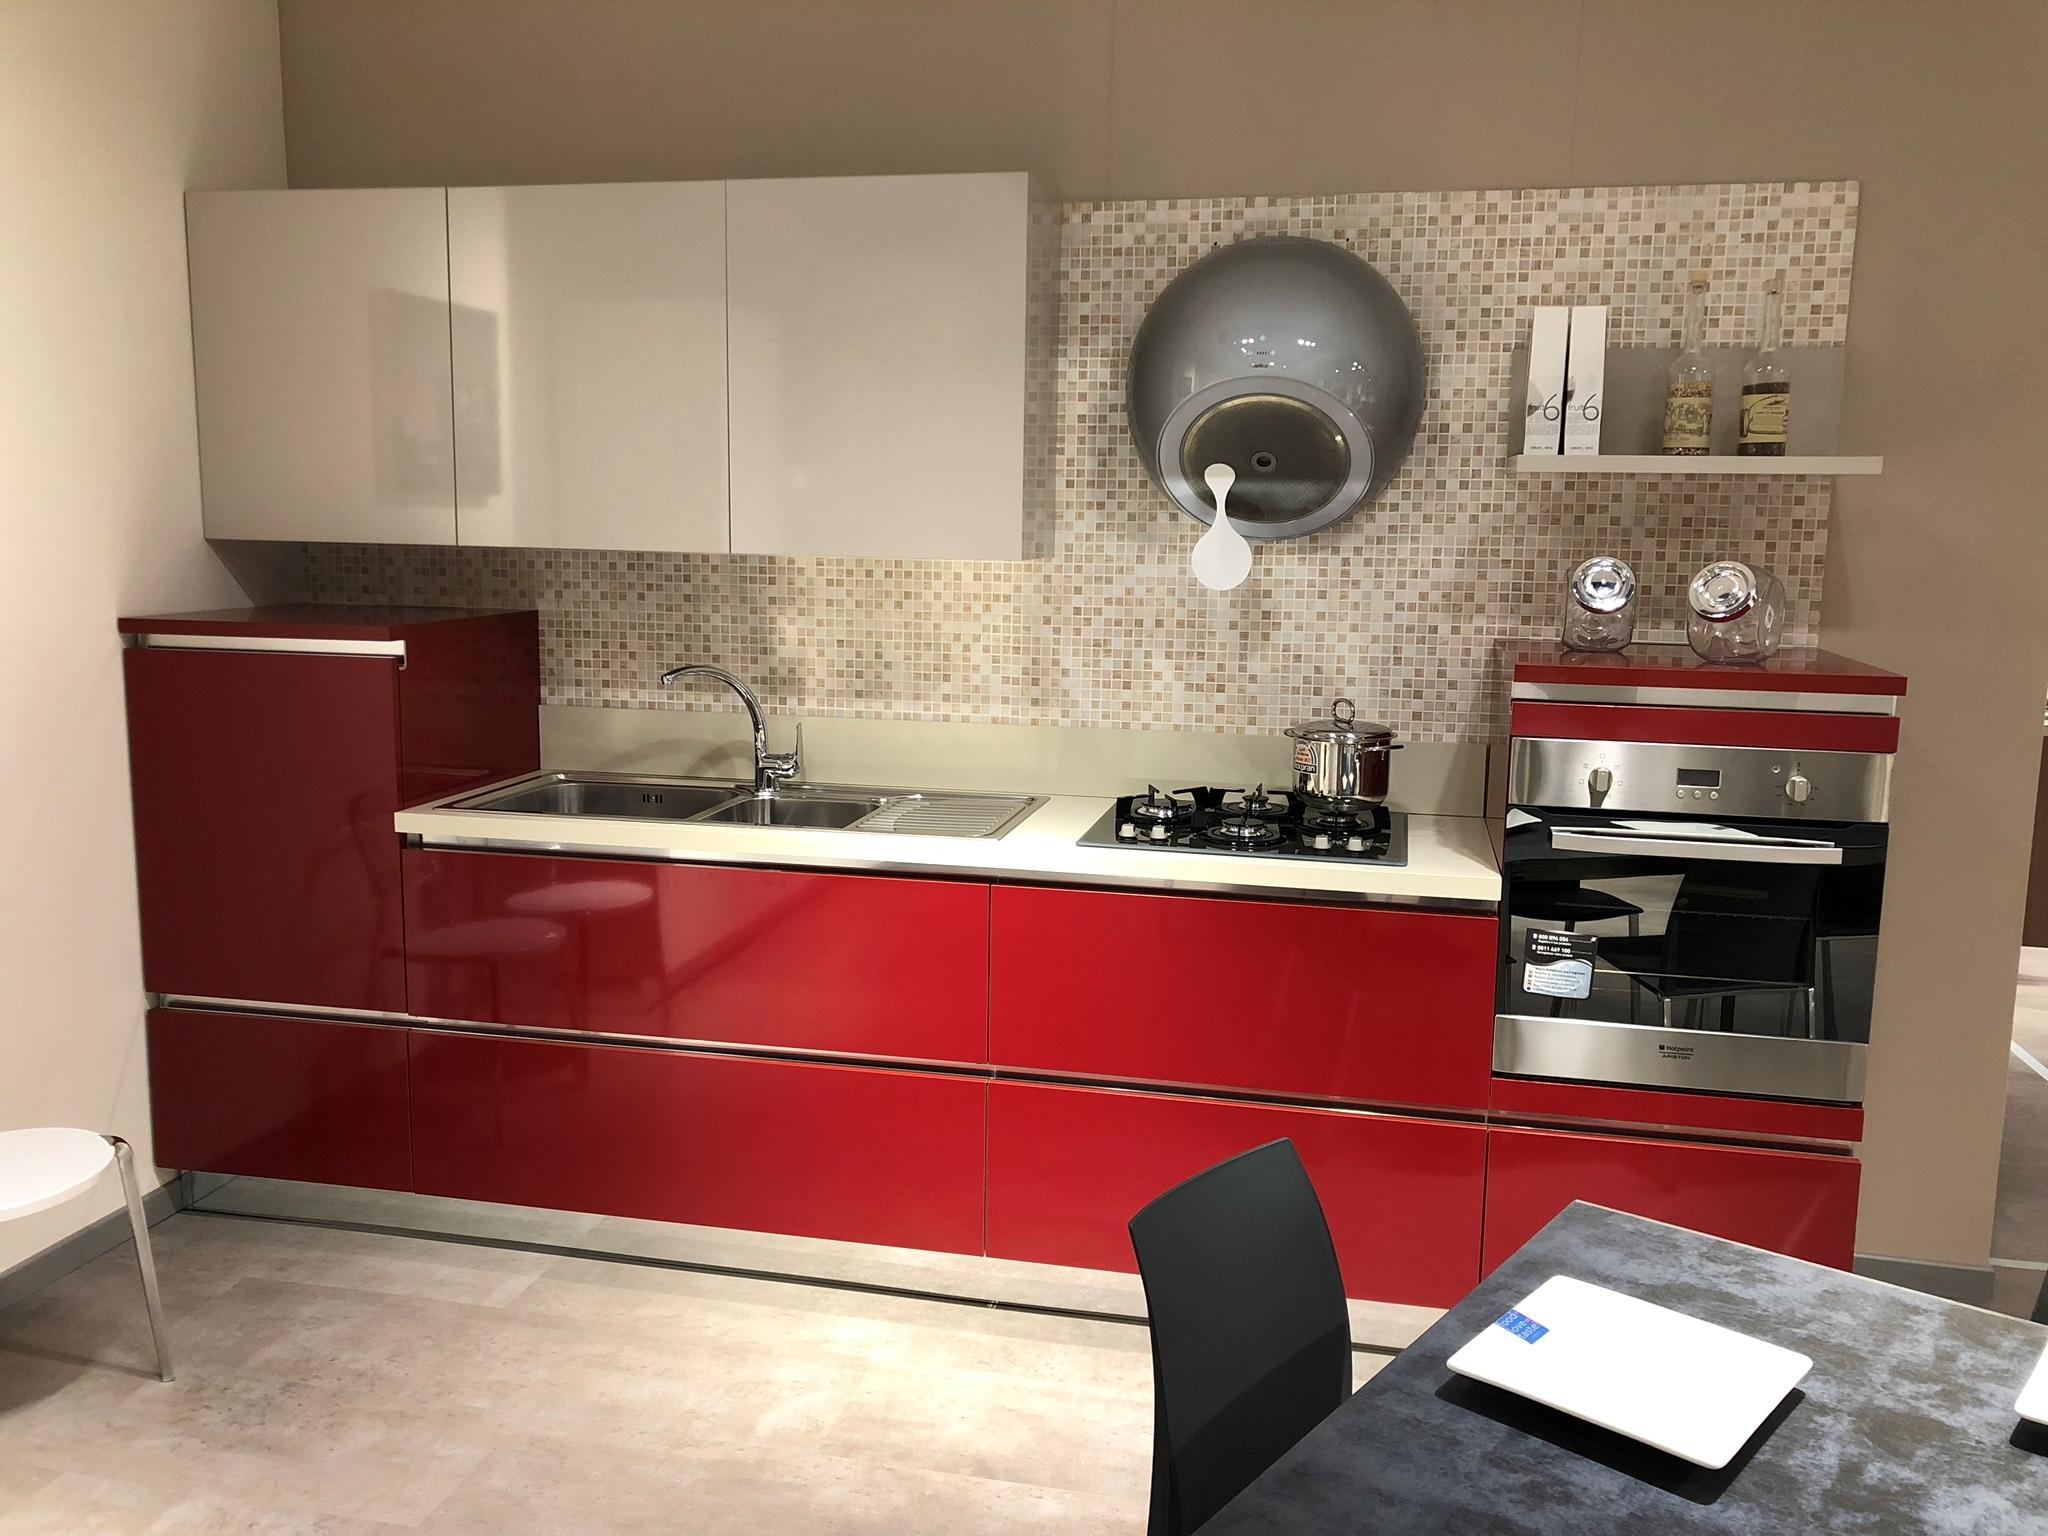 Emejing cucine rosse e bianche ideas ideas design 2017 - Piastrelle cucina rosse ...